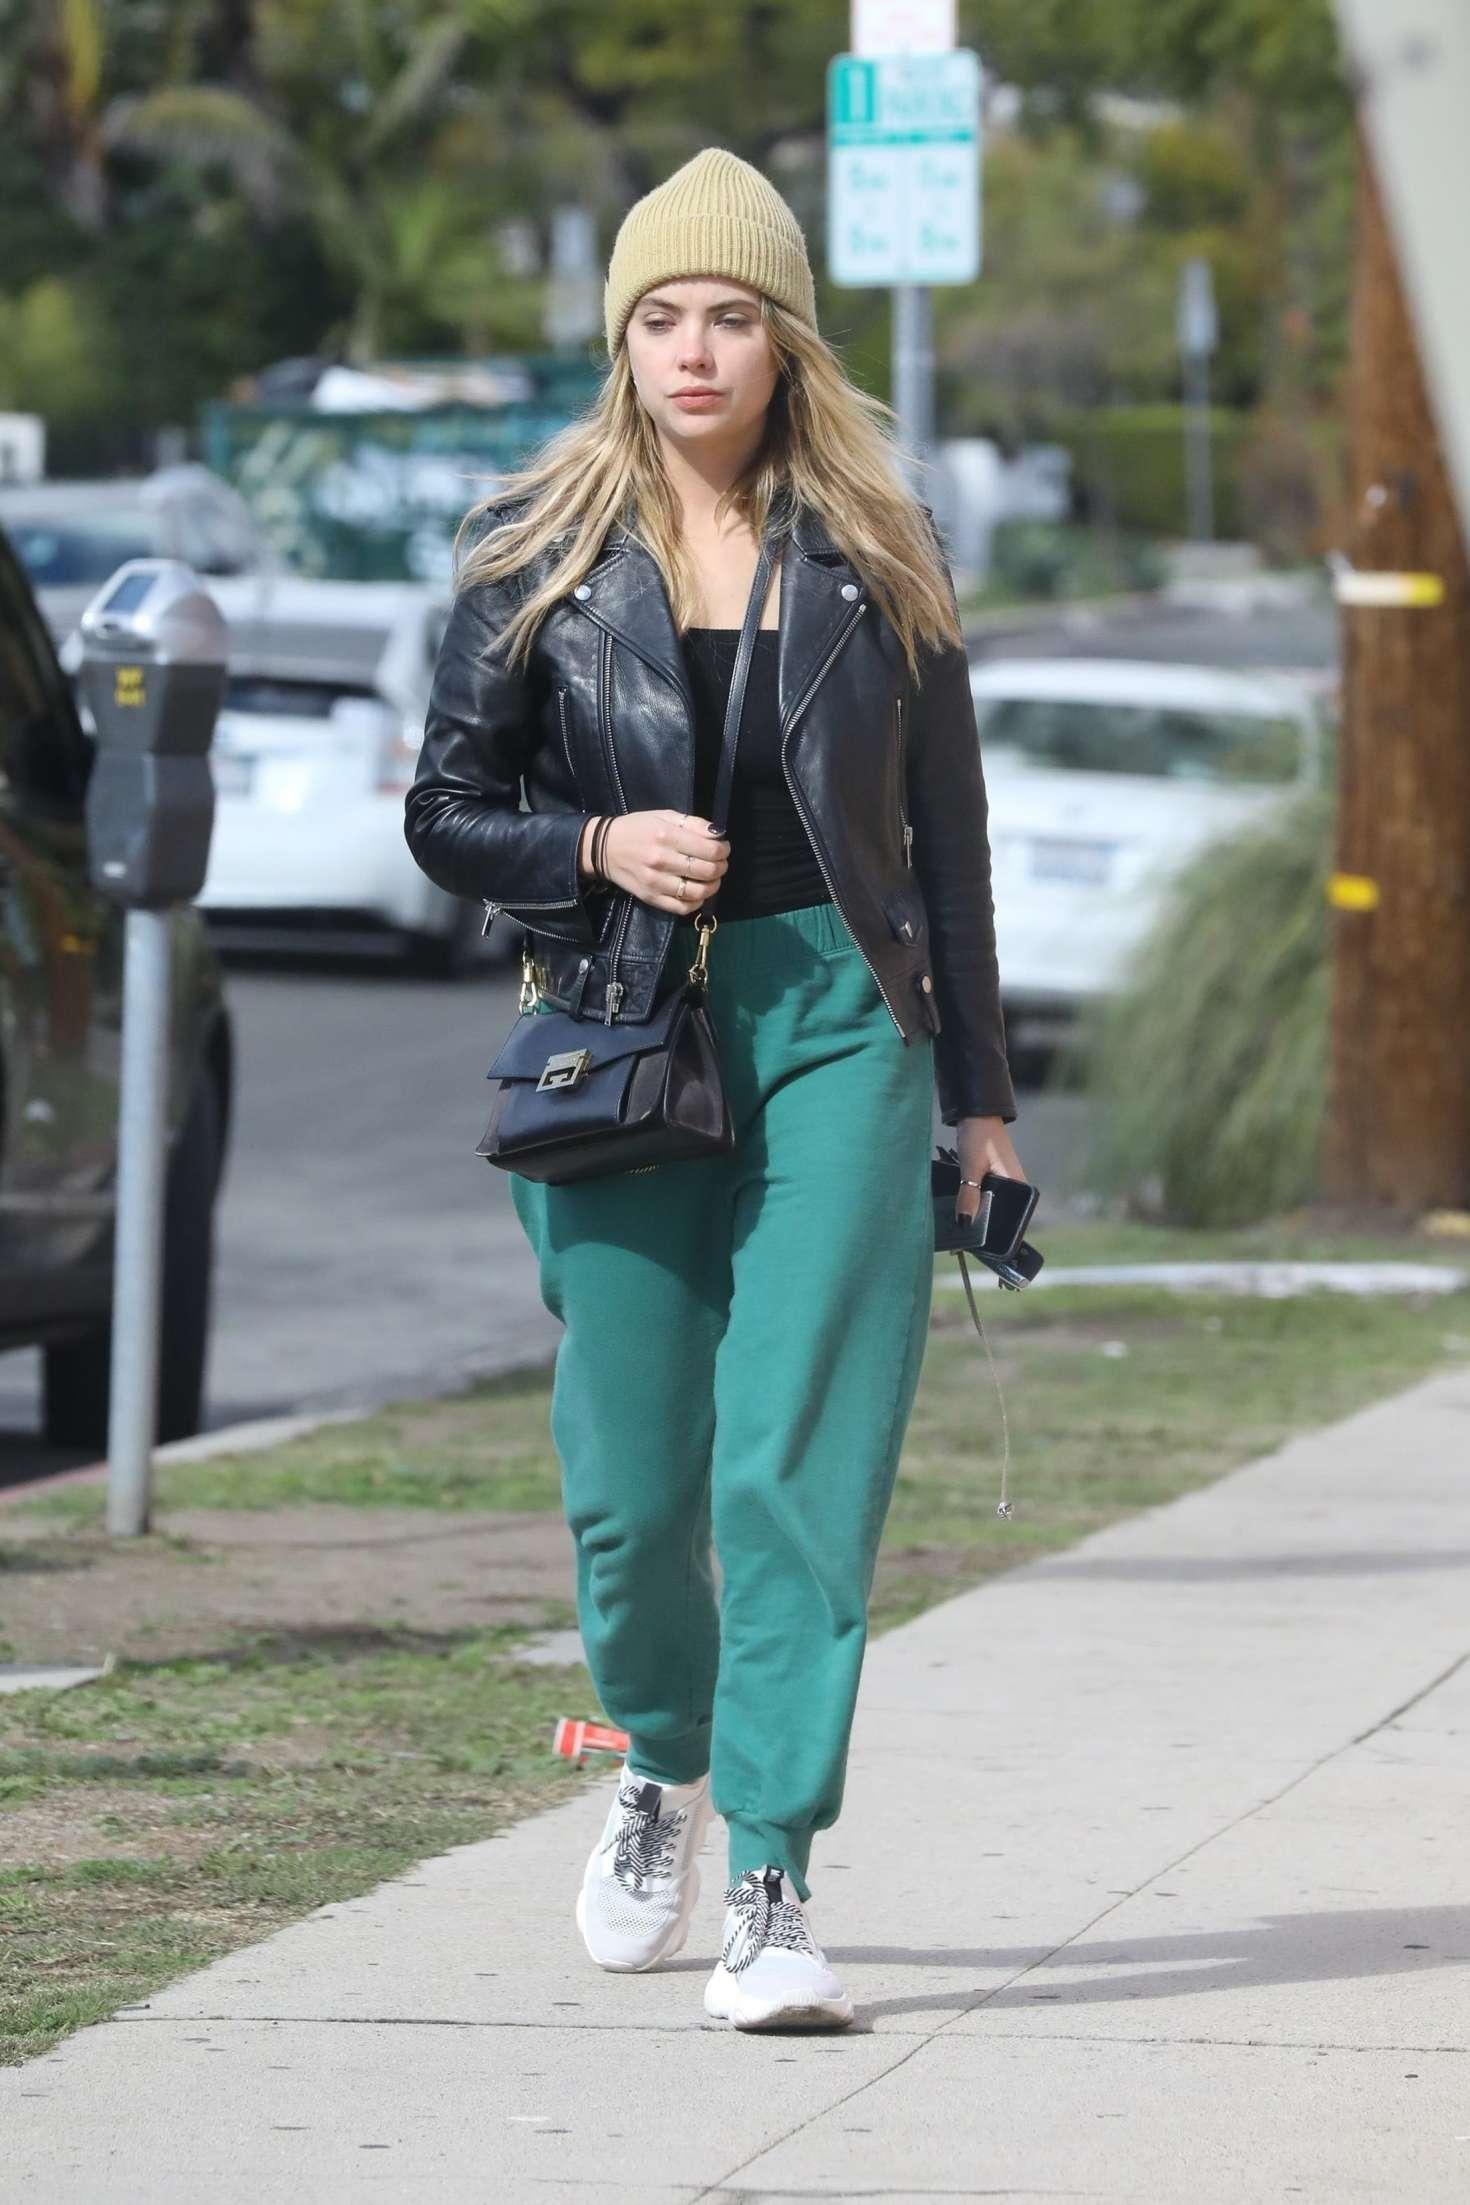 Ashley Benson 2019 : Ashley Benson in Green Sweatpants -03